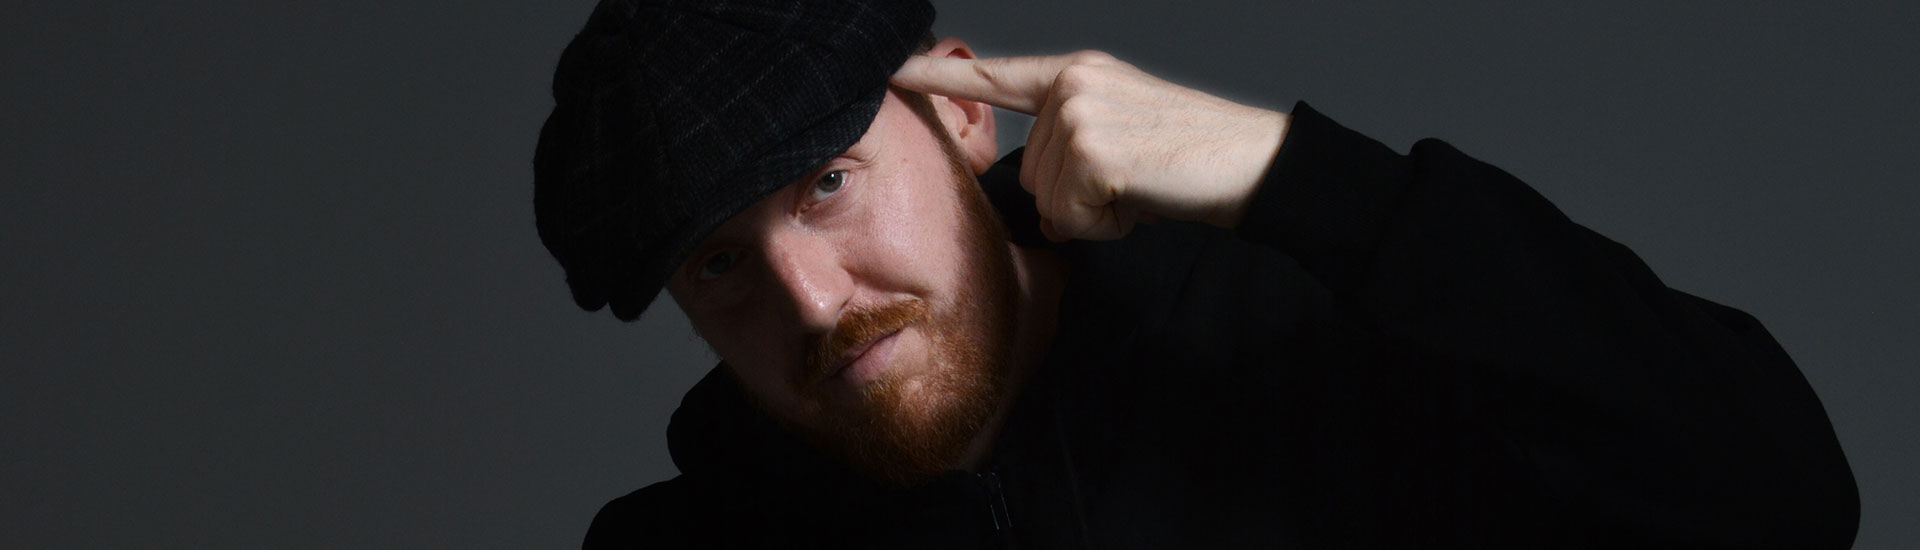 griogair labhruidh gaelic rapper